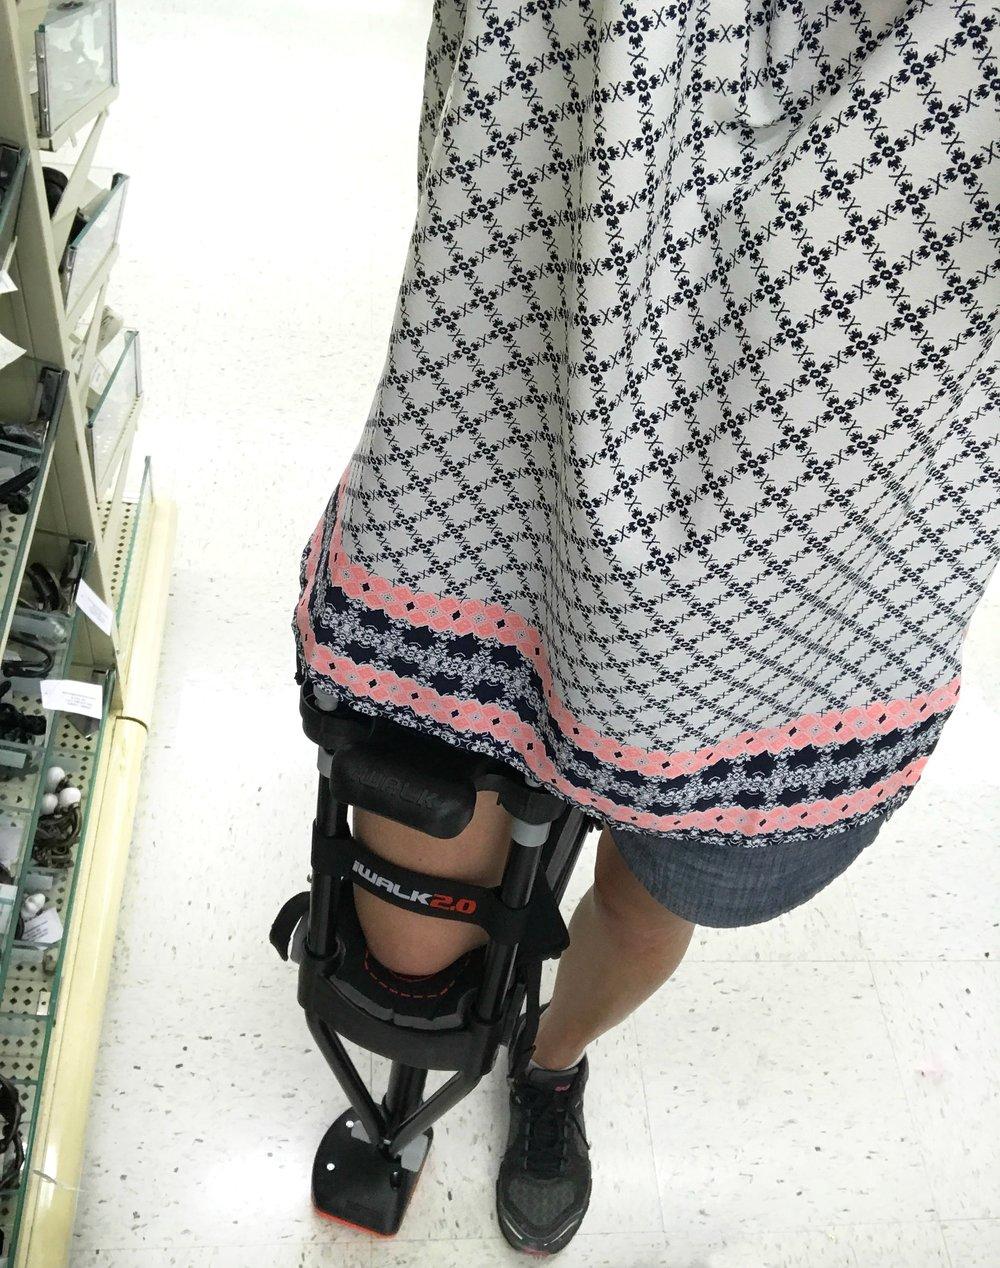 Iwalk crutch.jpg